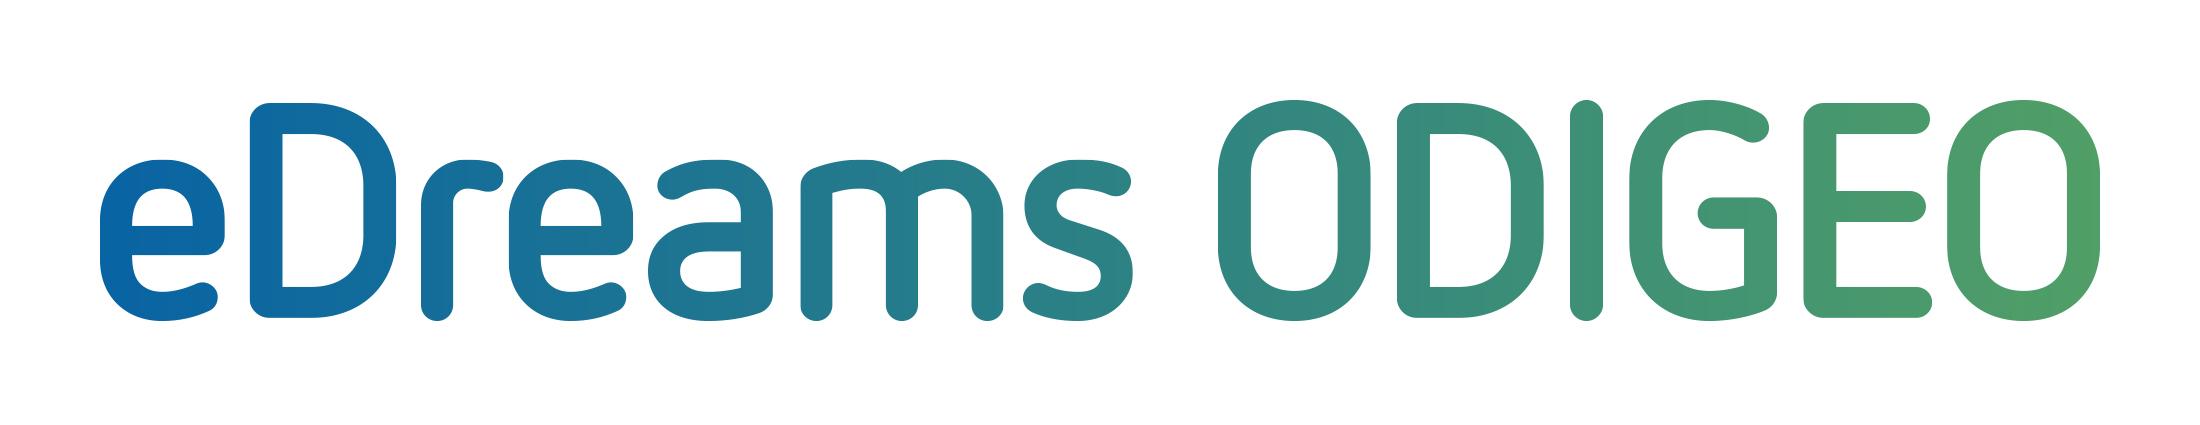 edreams odigeo rinnova la partnership con rentalcars